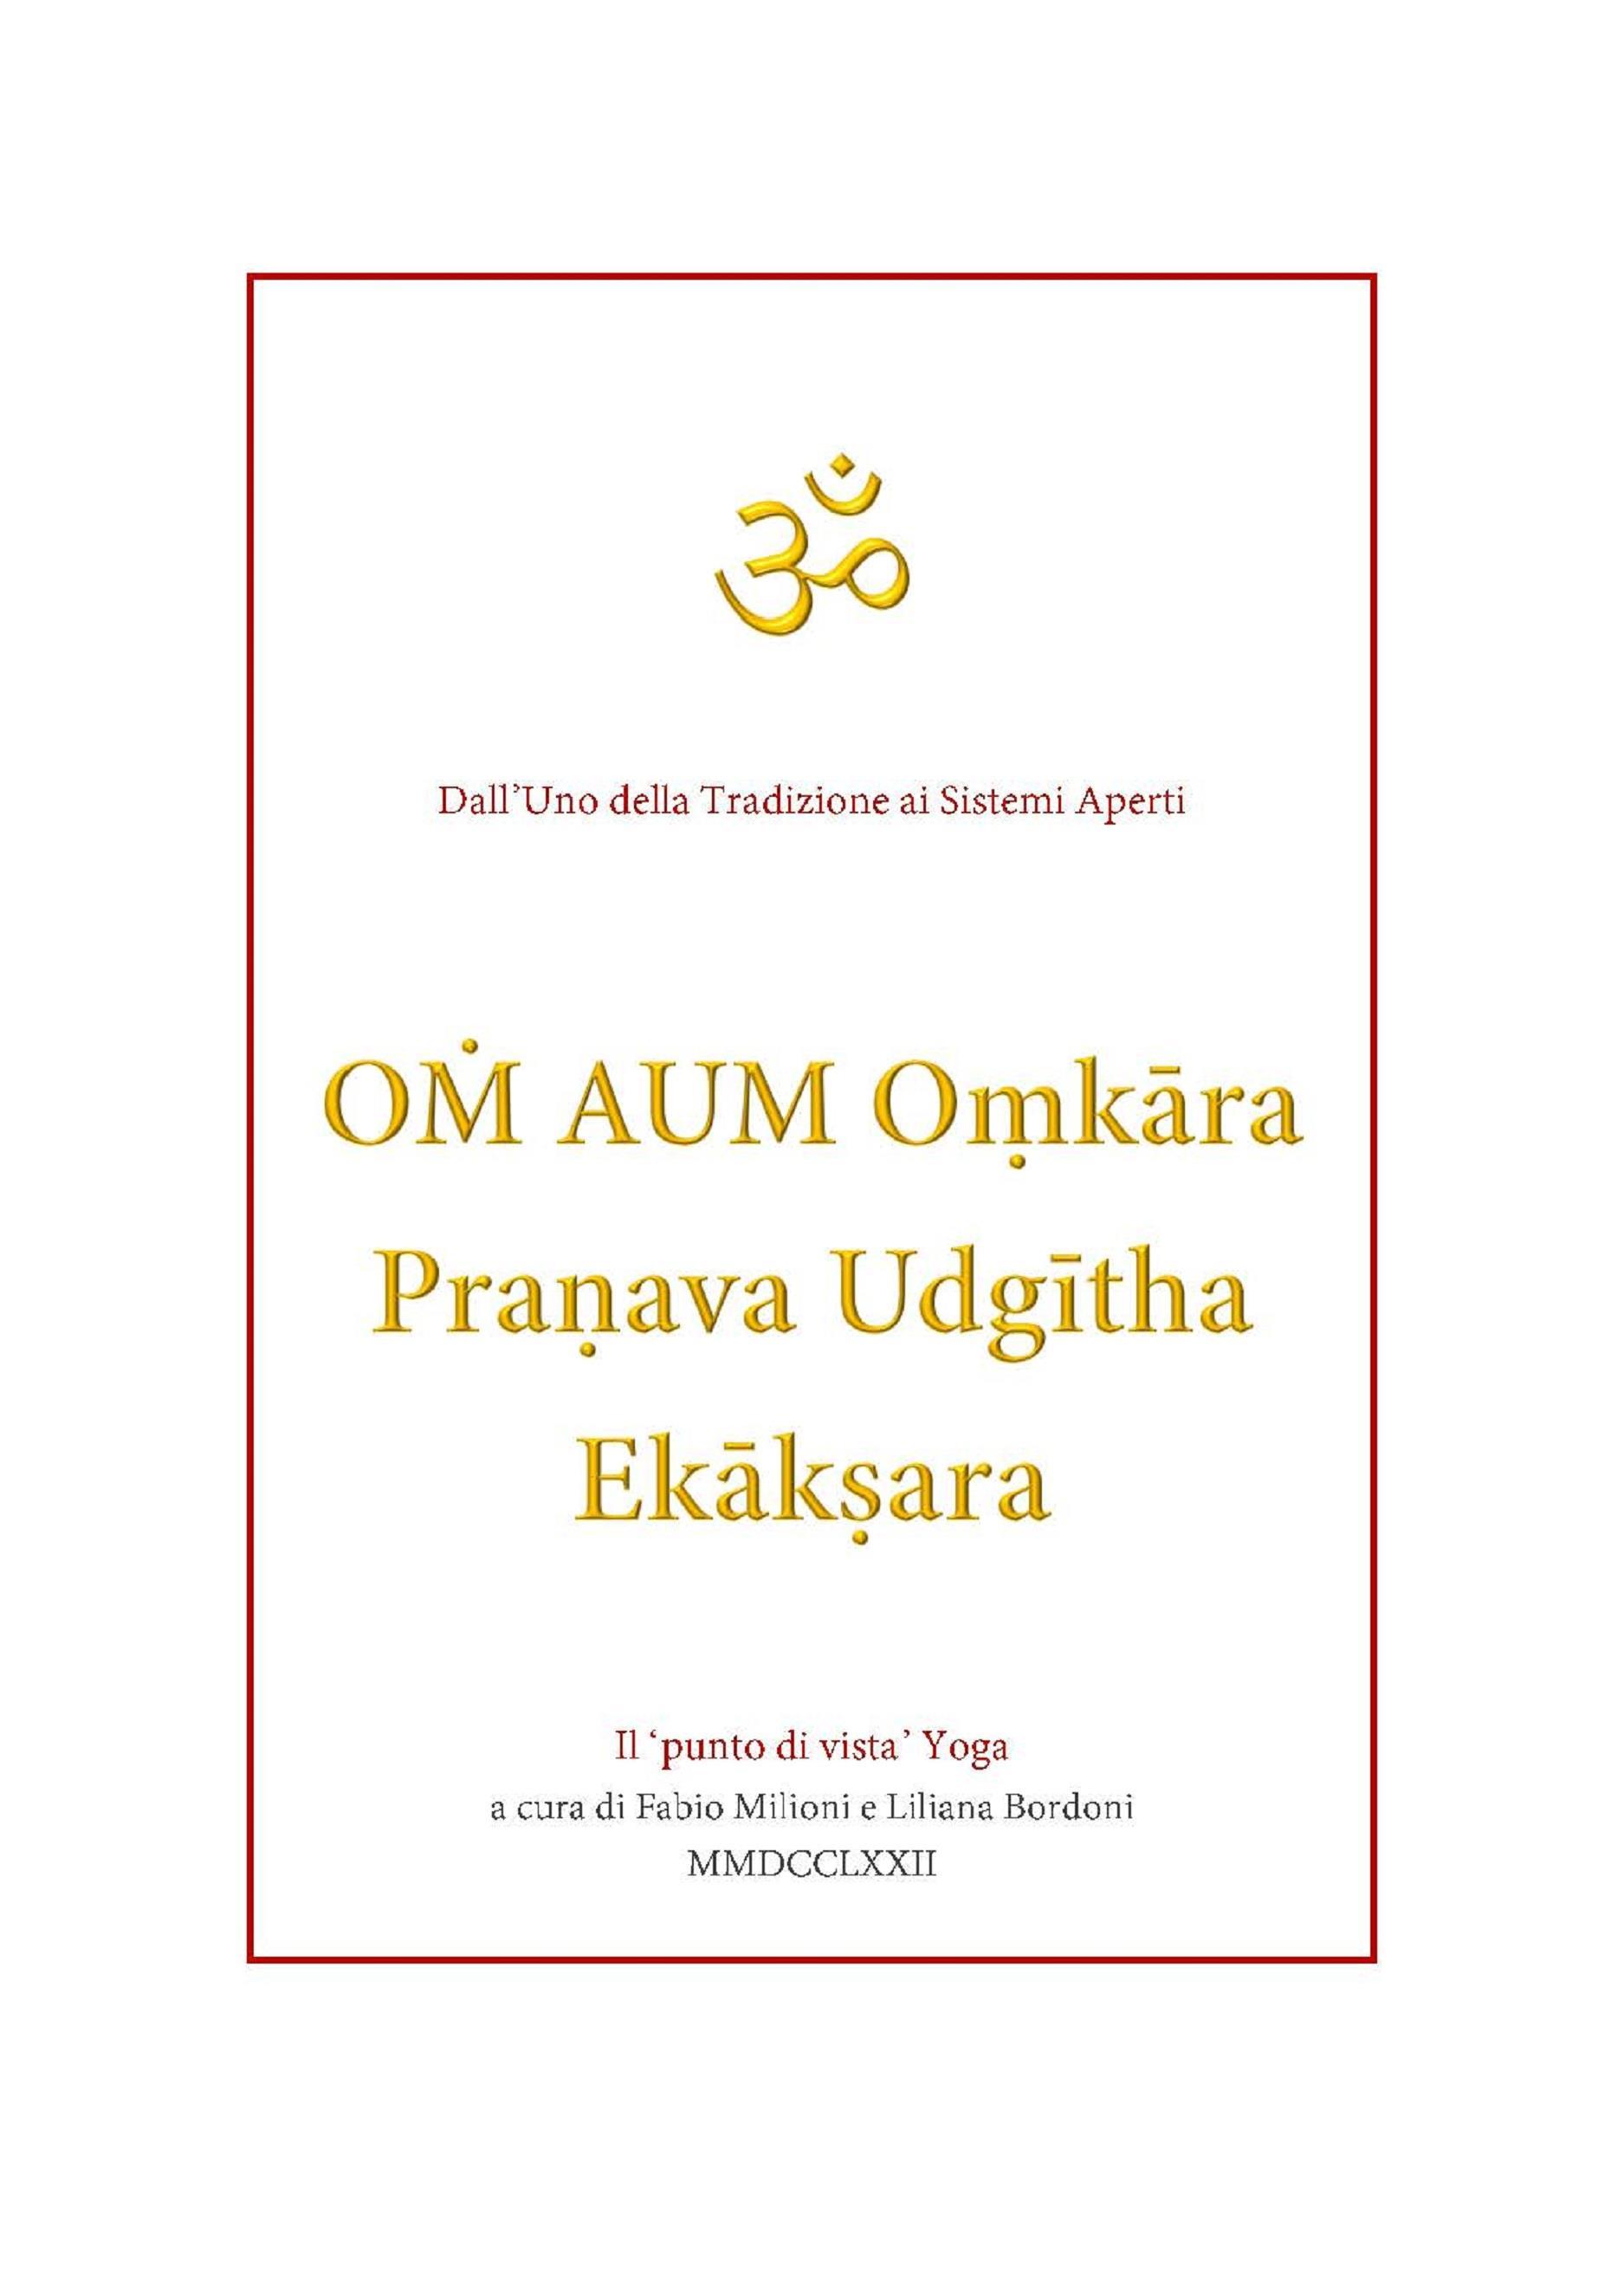 OṀ AUM Oṃkāra Praṇava Udgītha Ekākṣara traduzioni e note a cura di Fabio Milioni e Liliana Bordoni